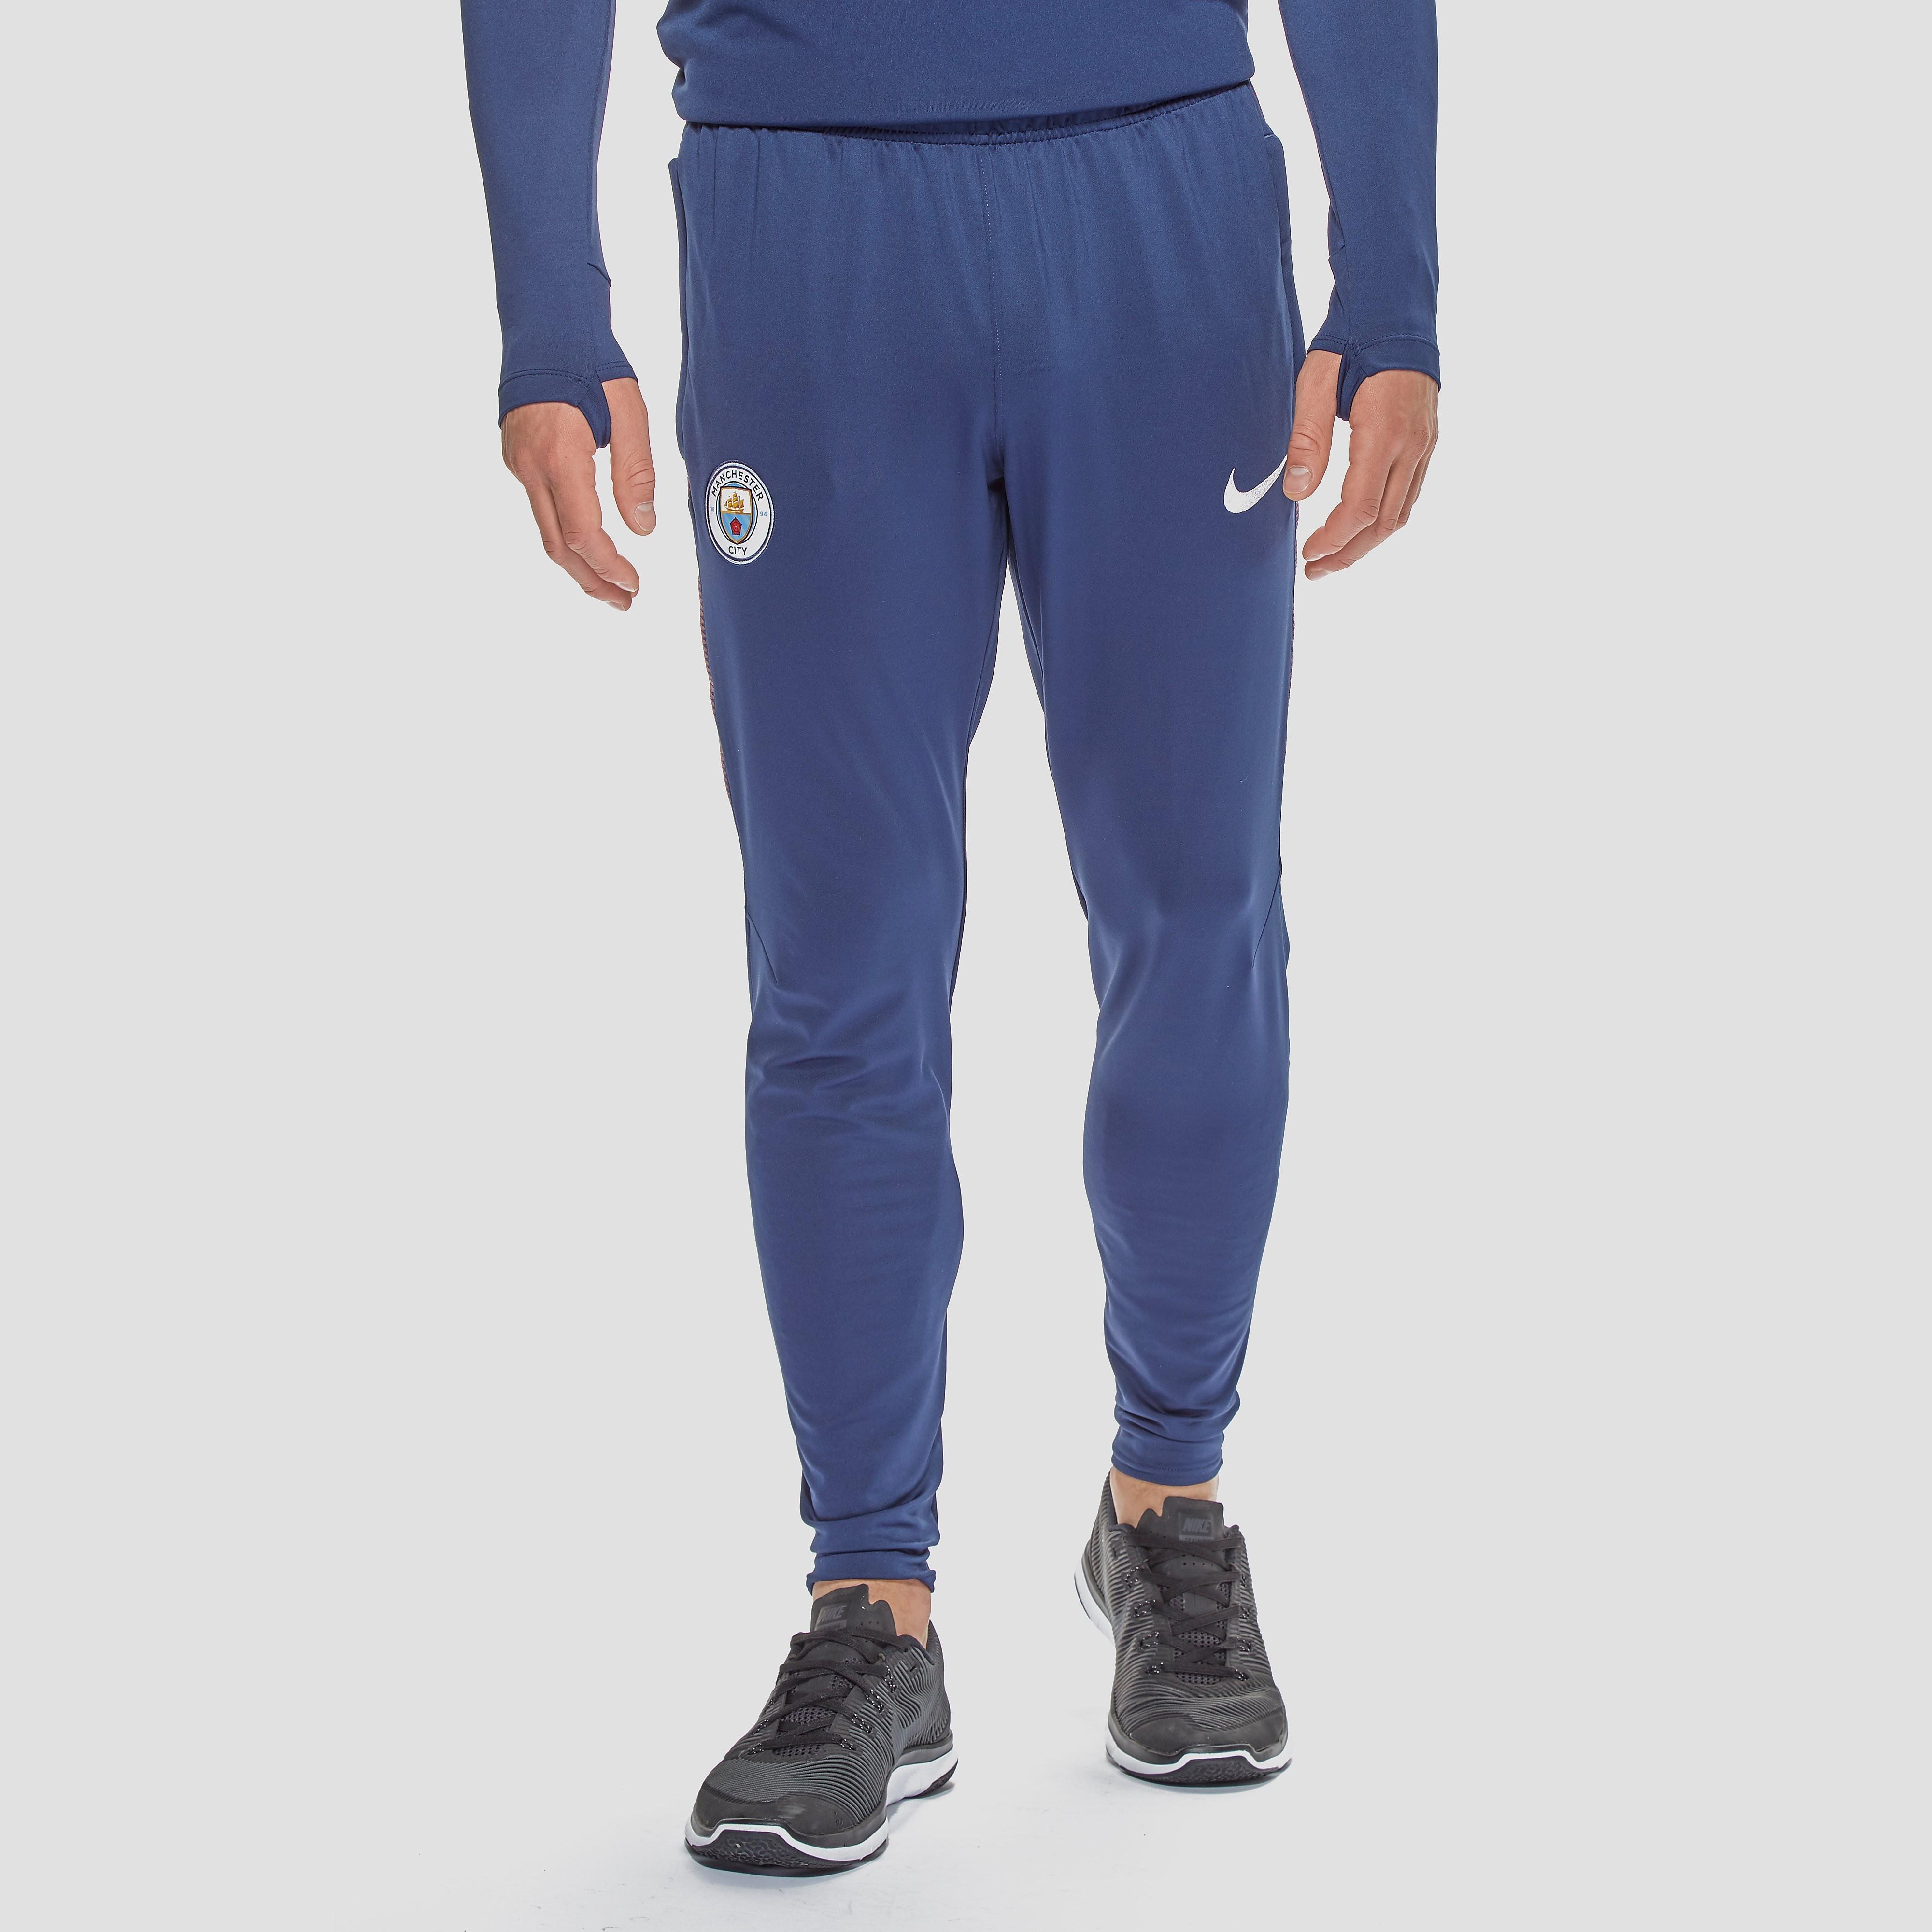 Nike Manchester City FC 2017 Men's Squad Training Pants